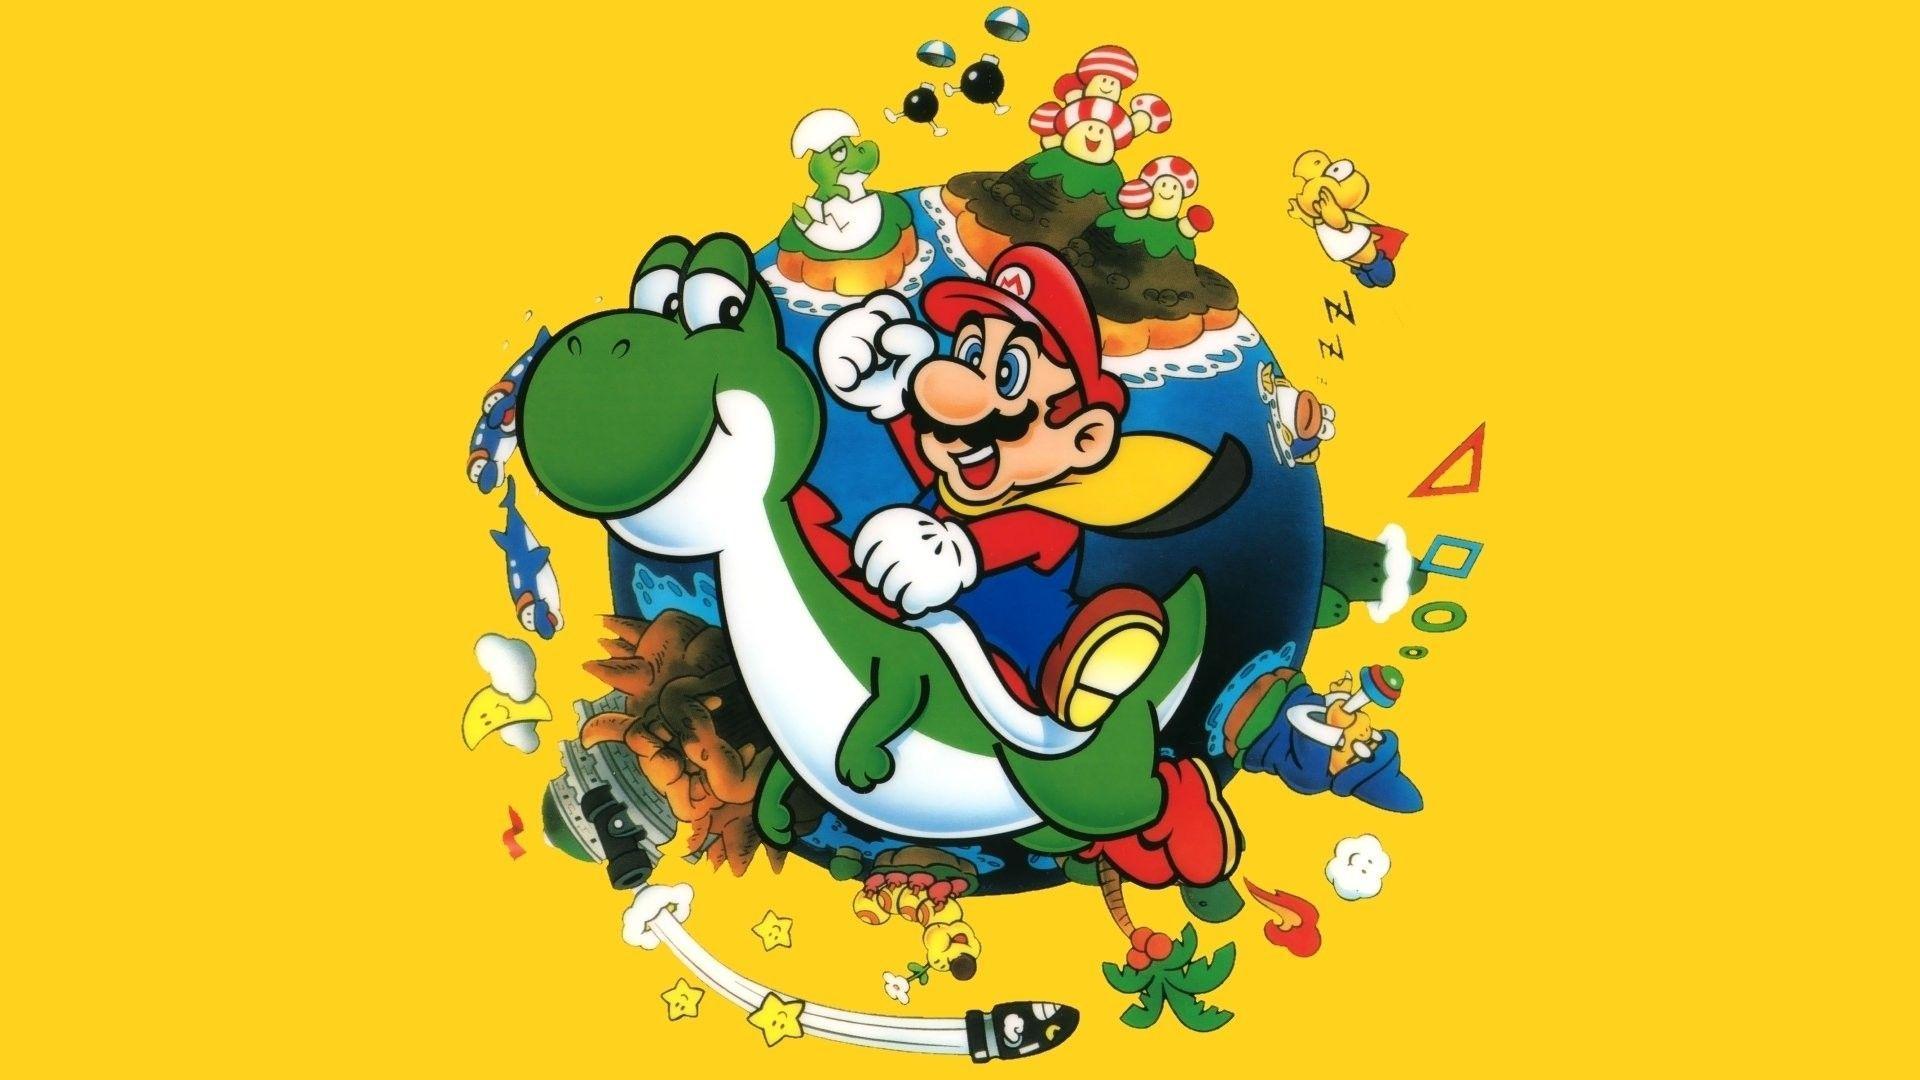 Super Mario World Wallpapers Top Free Super Mario World